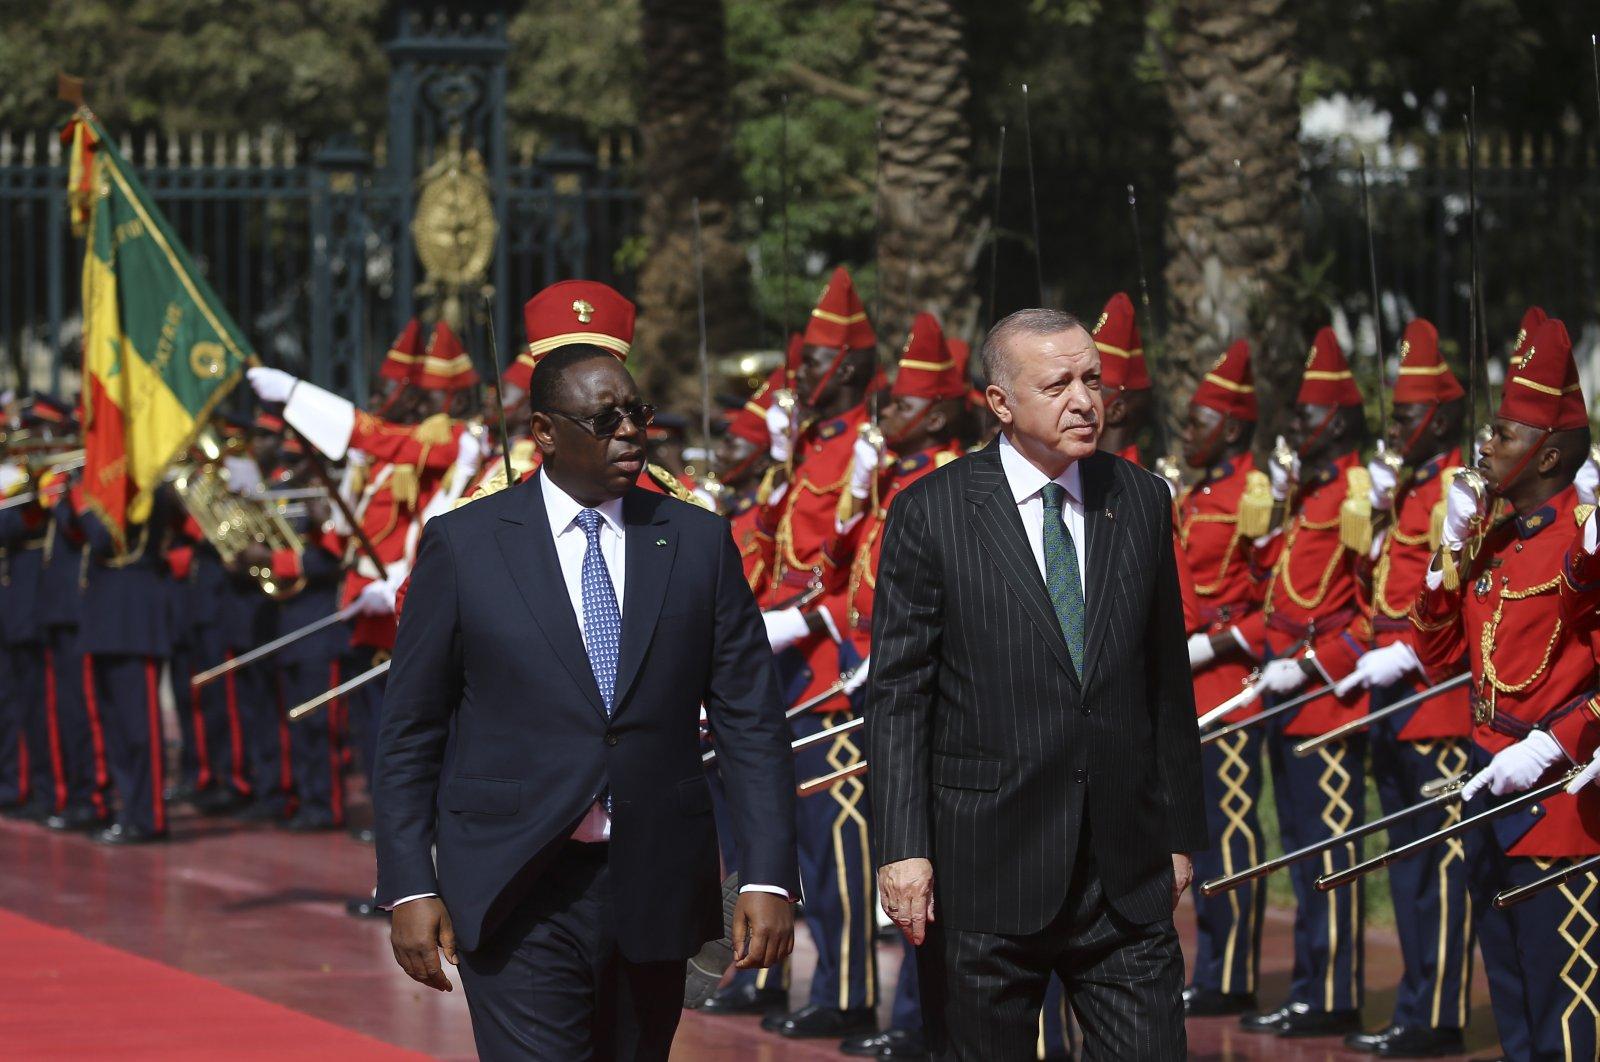 President Recep Tayyip Erdoğan and his Senegalese counterpart Macky Sall salute Senegalese soldiers during Erdoğan's visit to Dakar, Jan. 29, 2020. (AA)